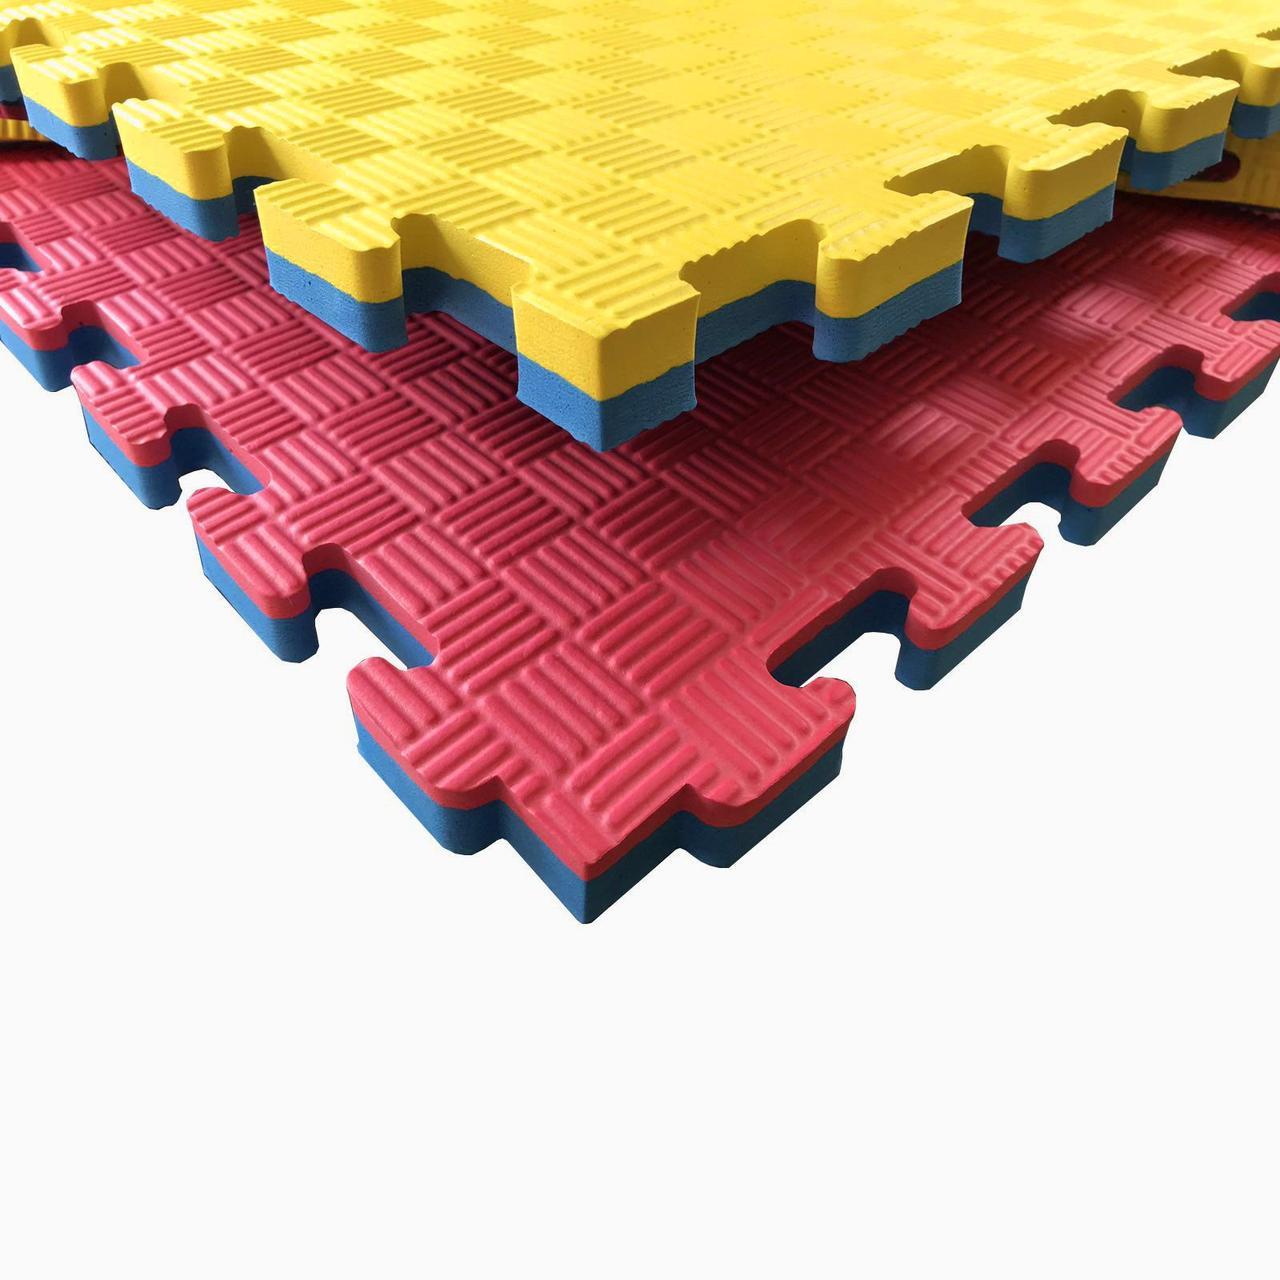 Коврик Ласточкин Хвост желто-синий 25 мм